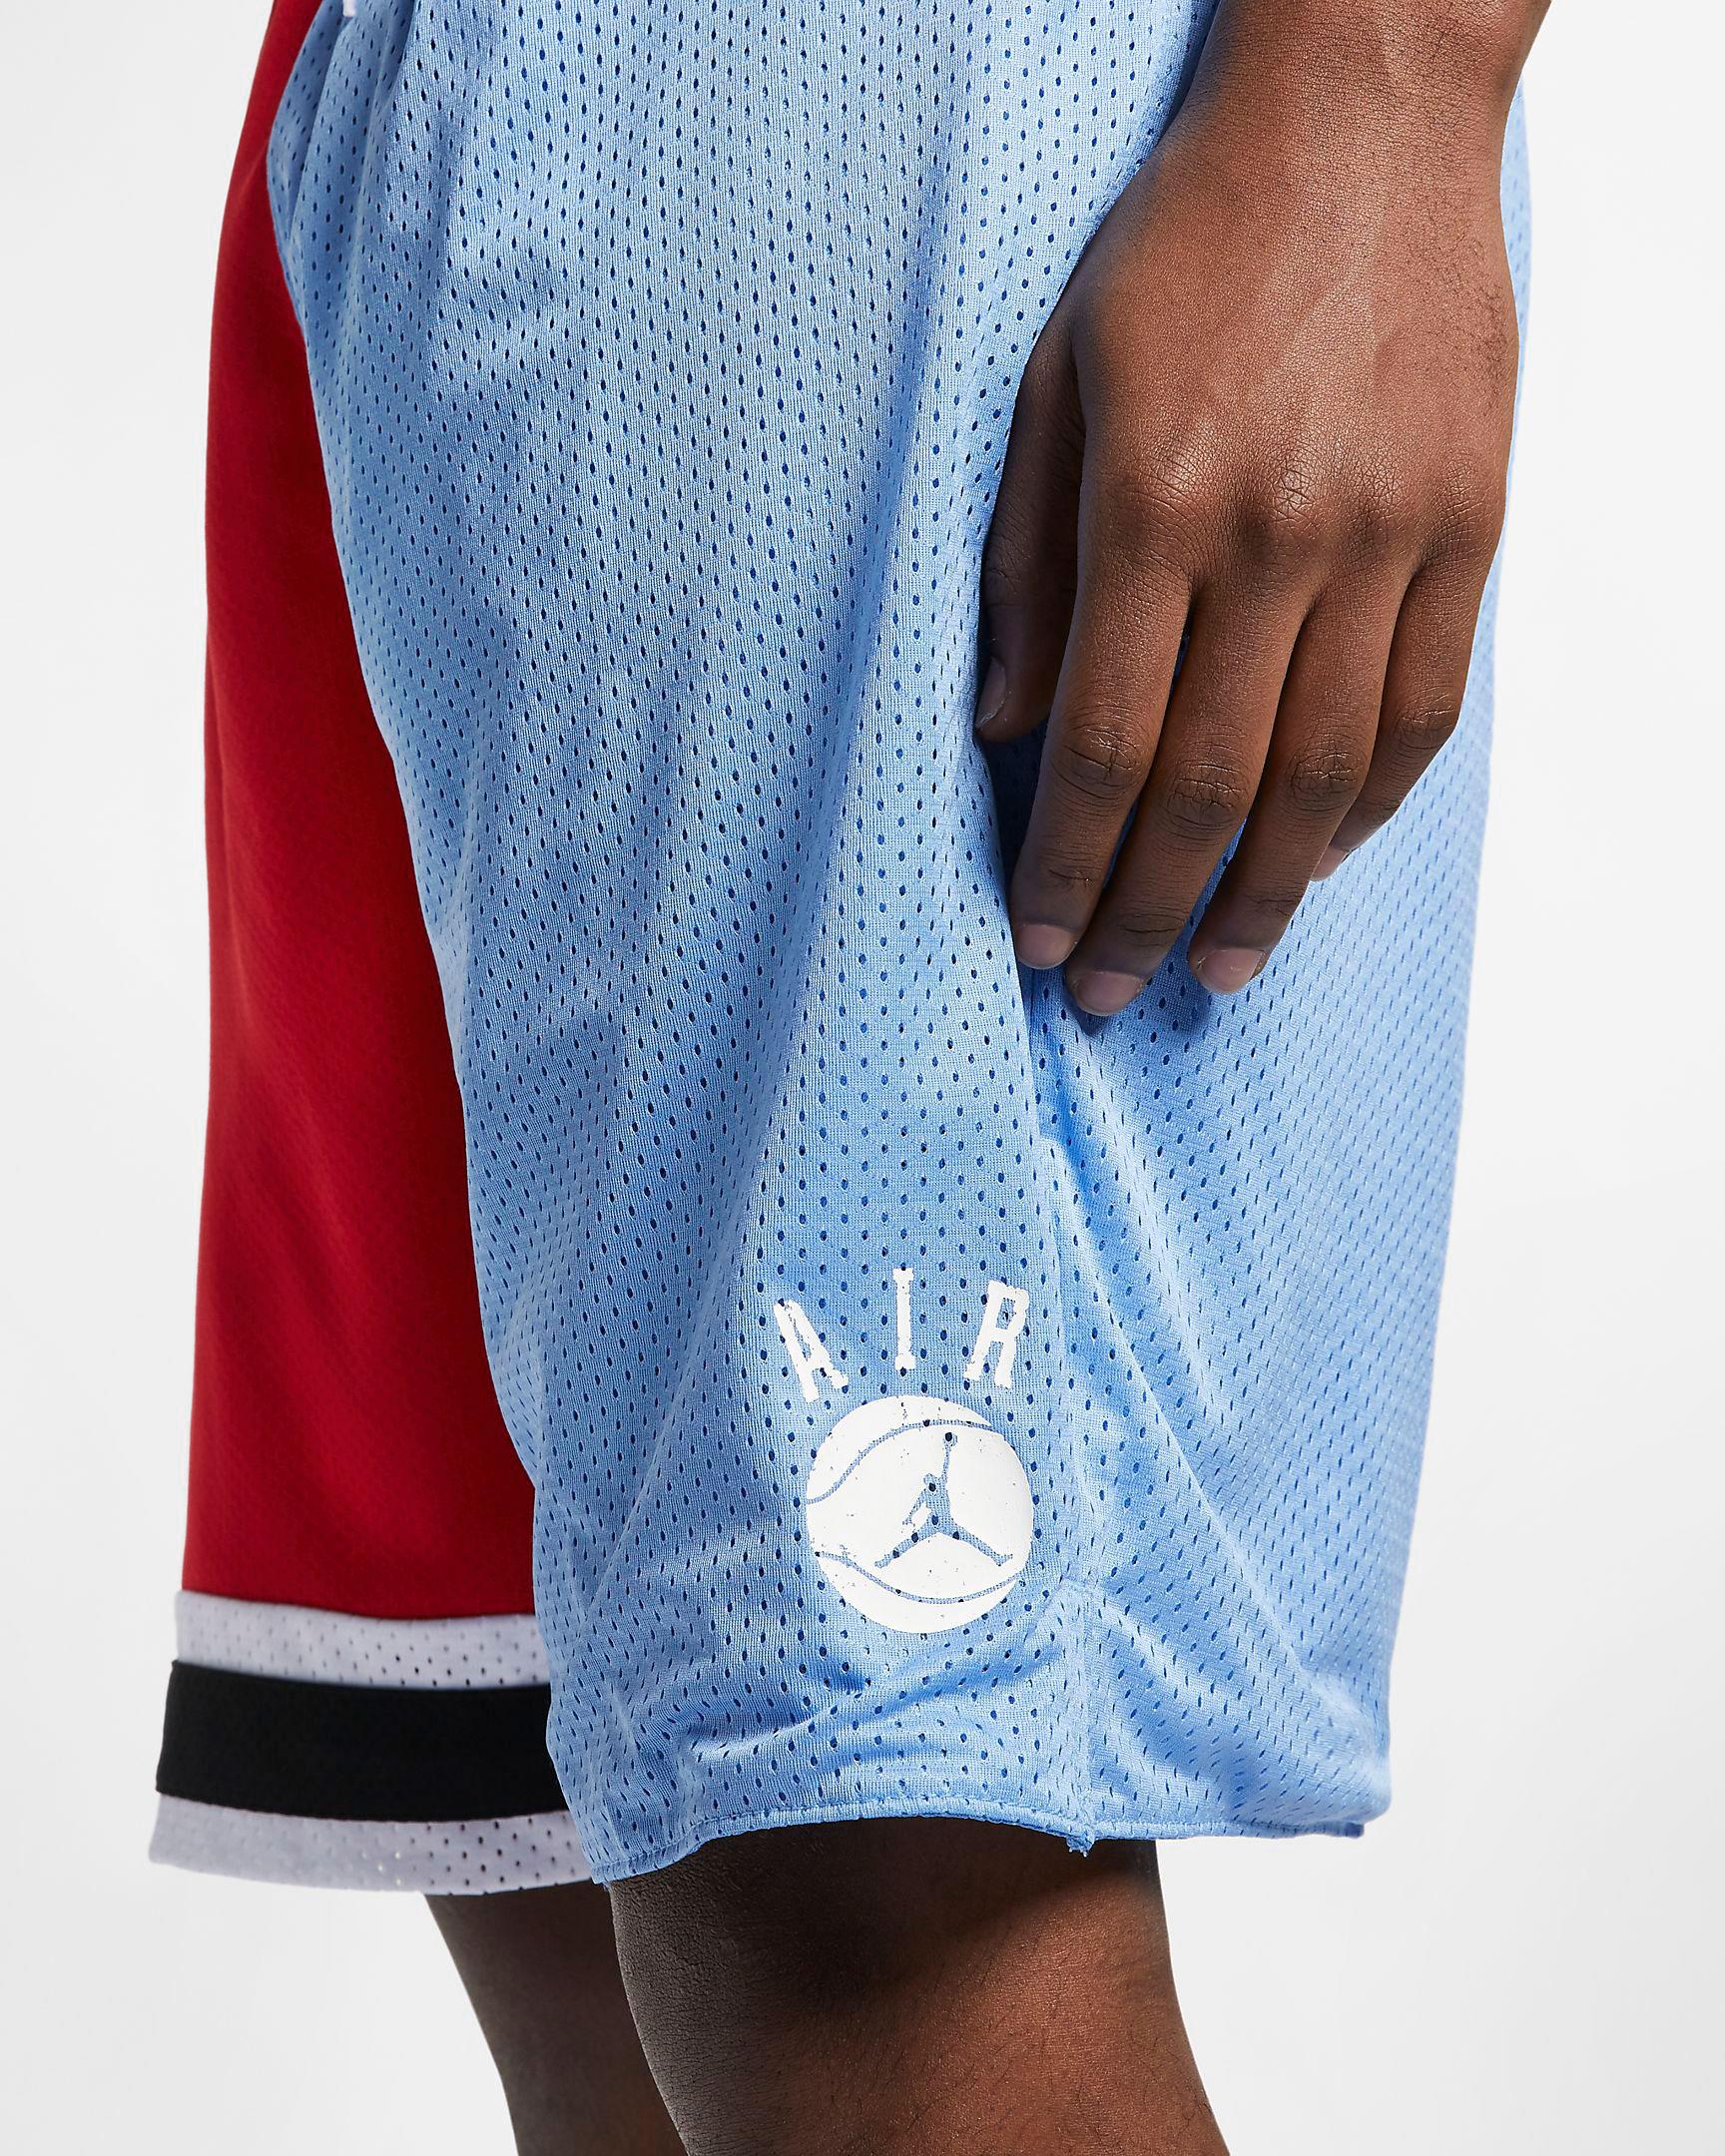 jordan-4-bred-shorts-match-2